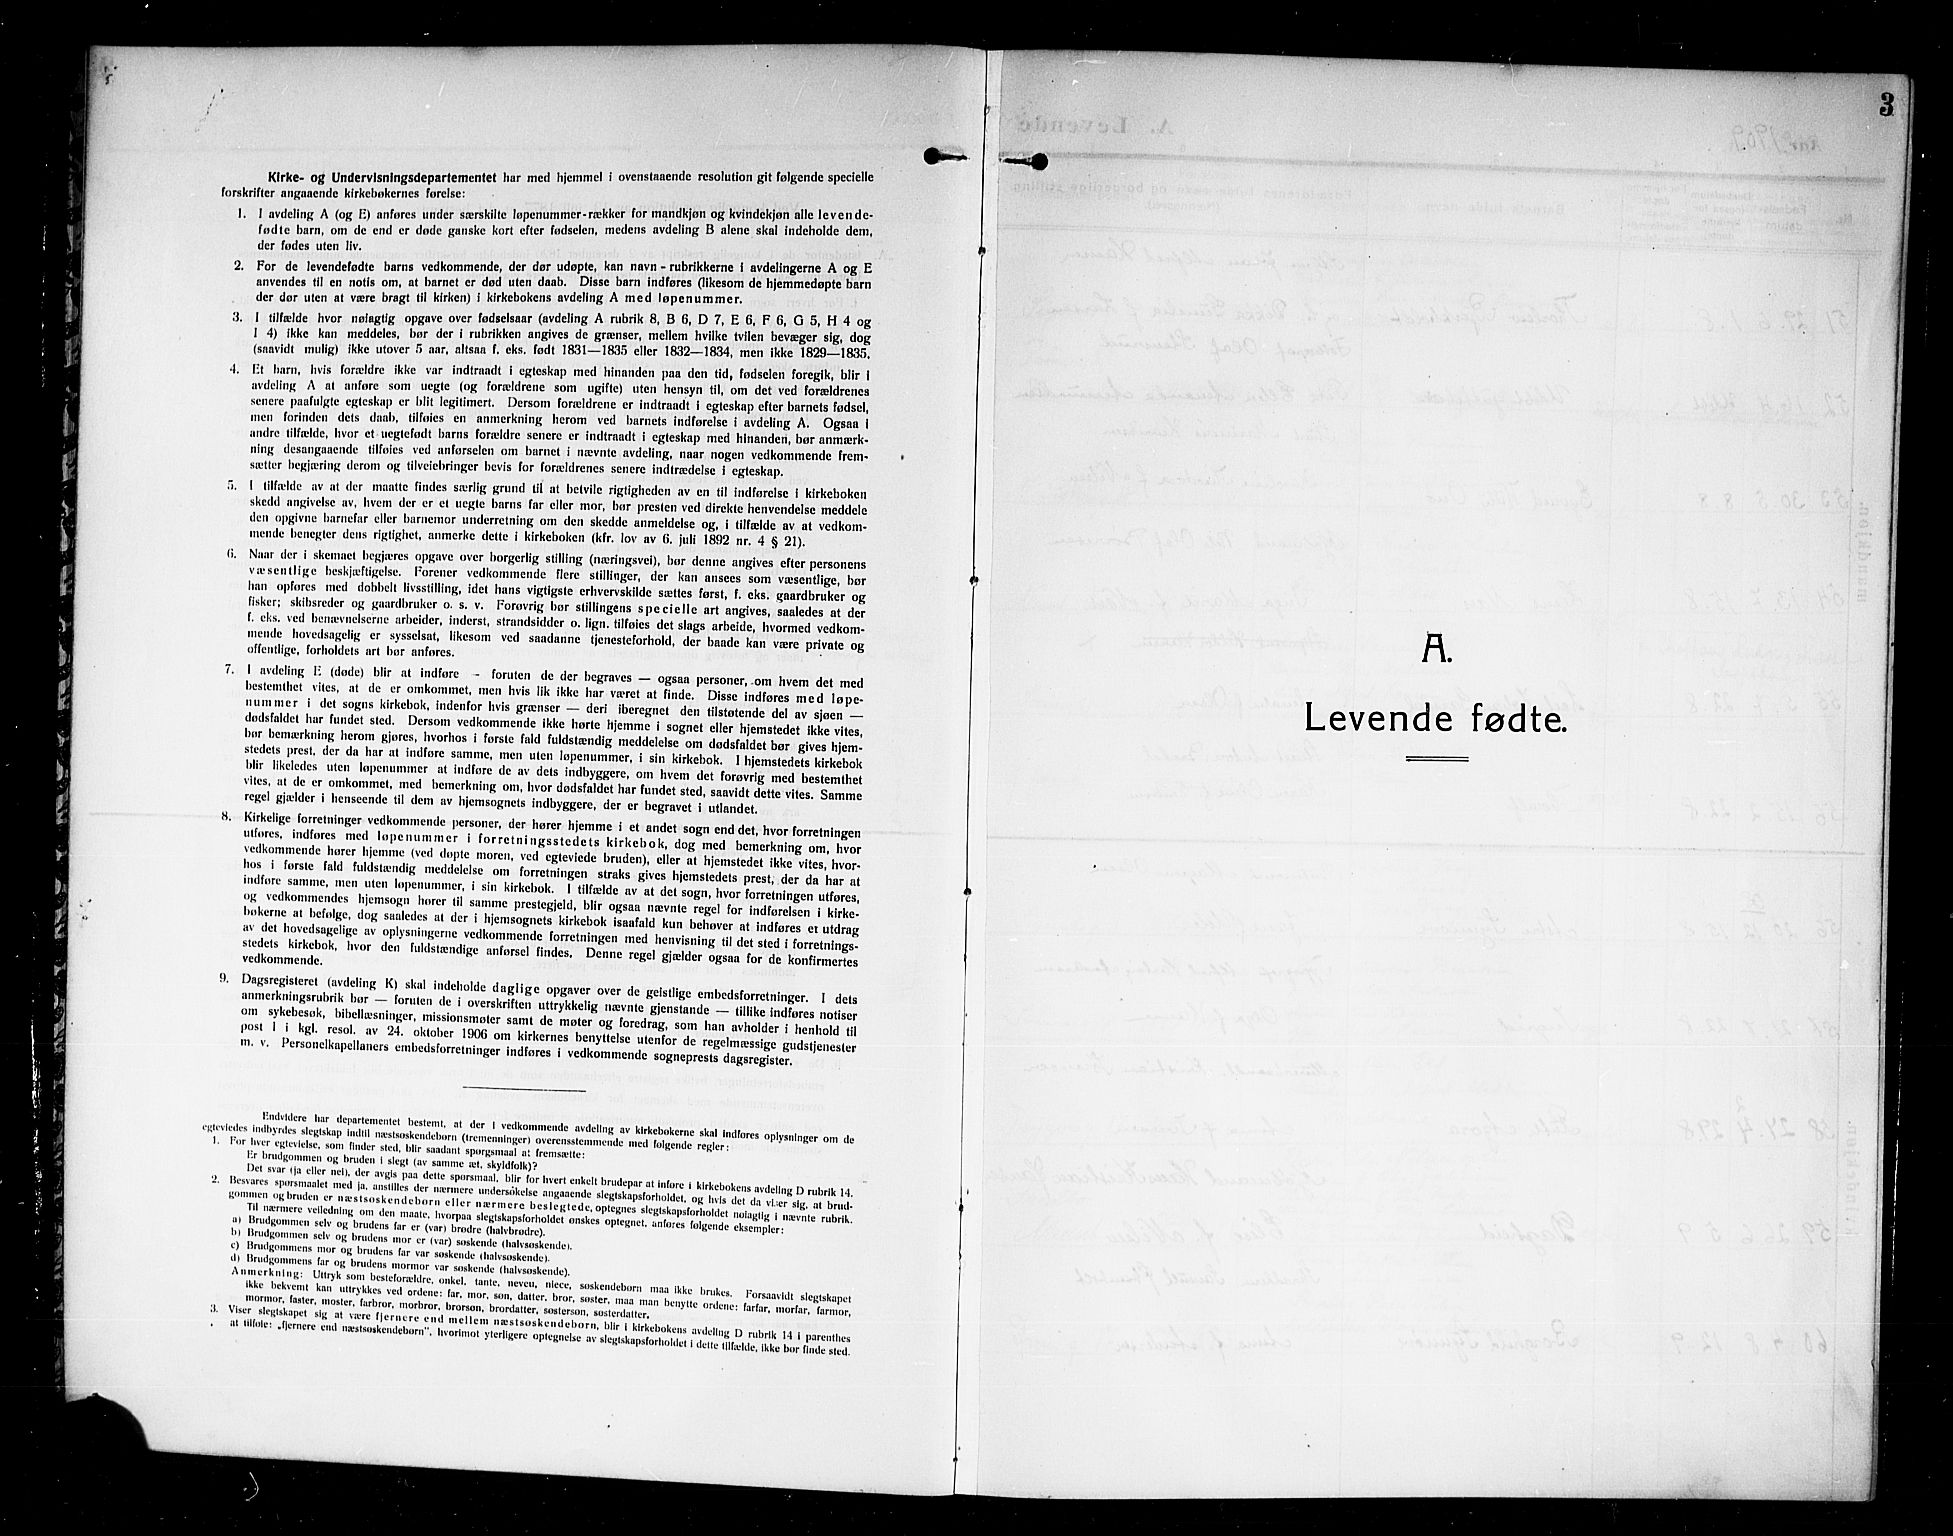 SAKO, Larvik kirkebøker, G/Ga/L0008: Klokkerbok nr. I 8, 1909-1920, s. 3